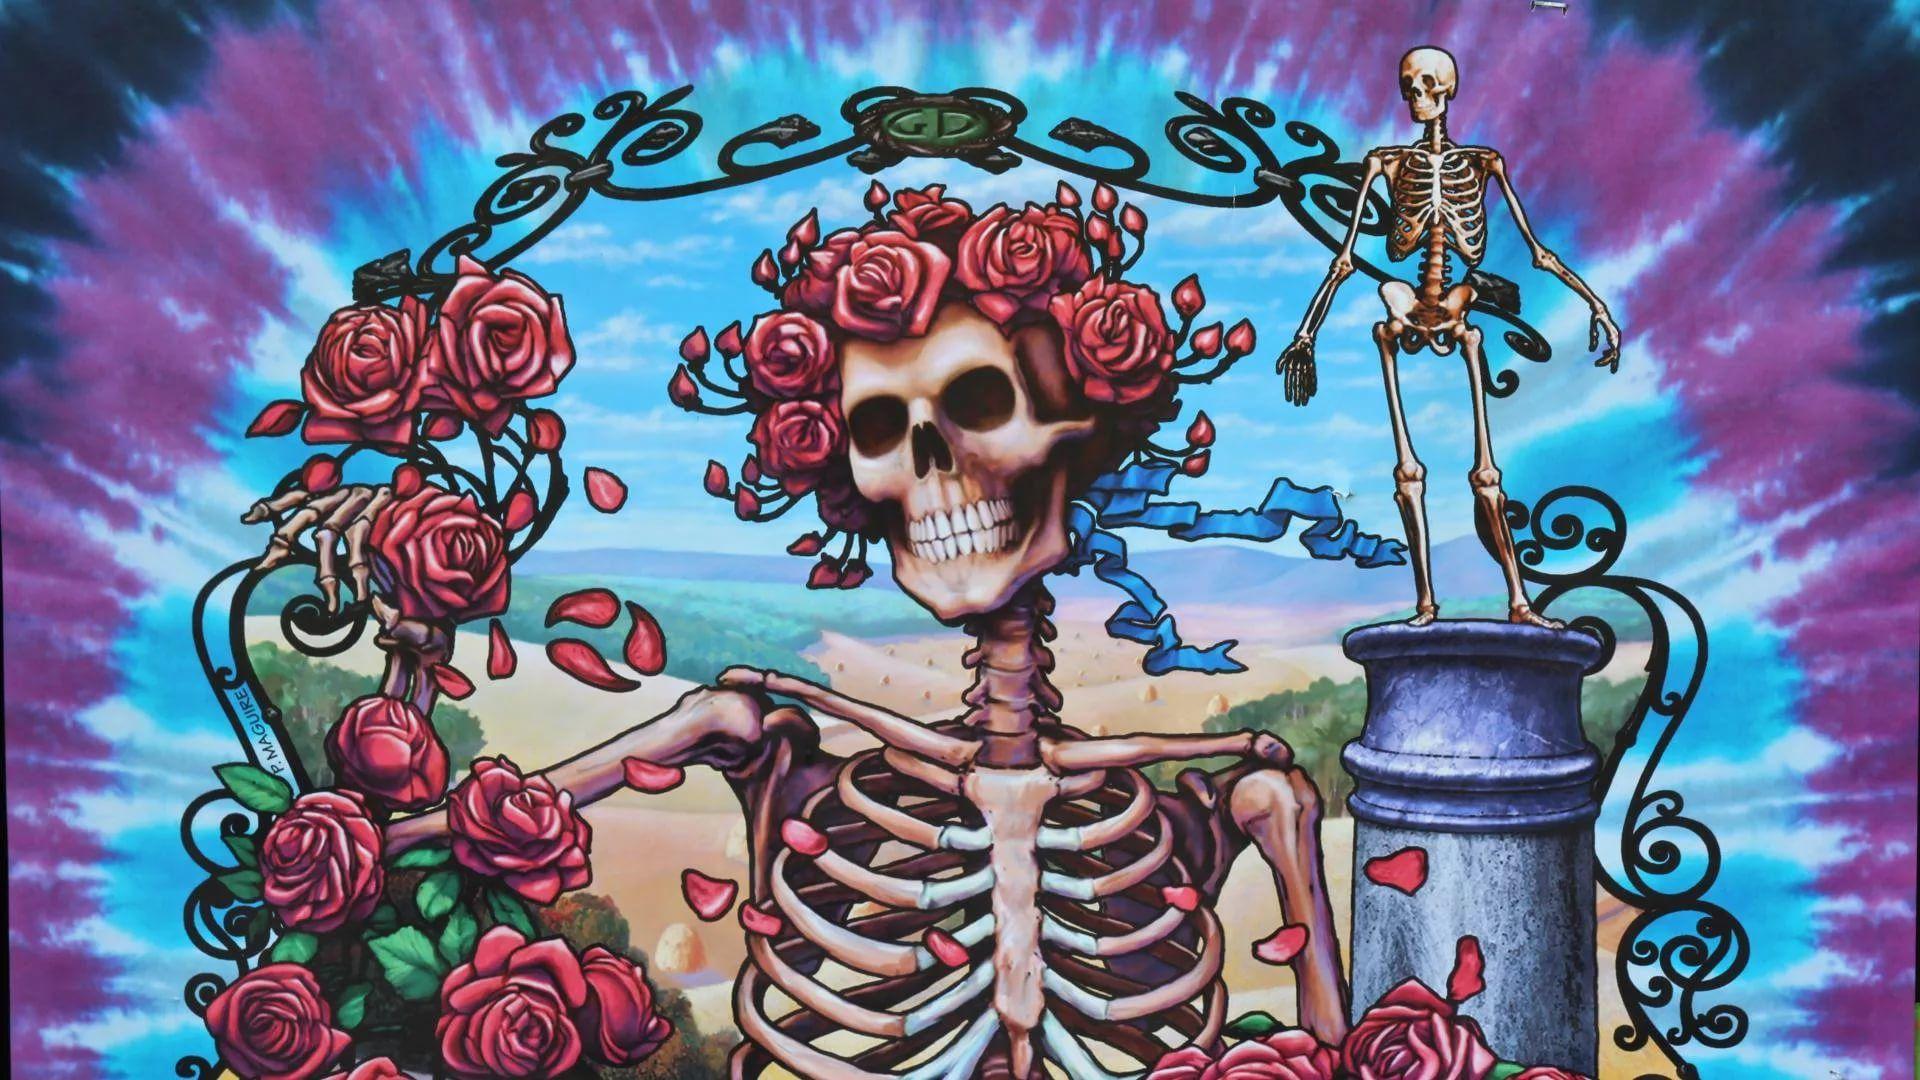 Grateful Dead new wallpaper